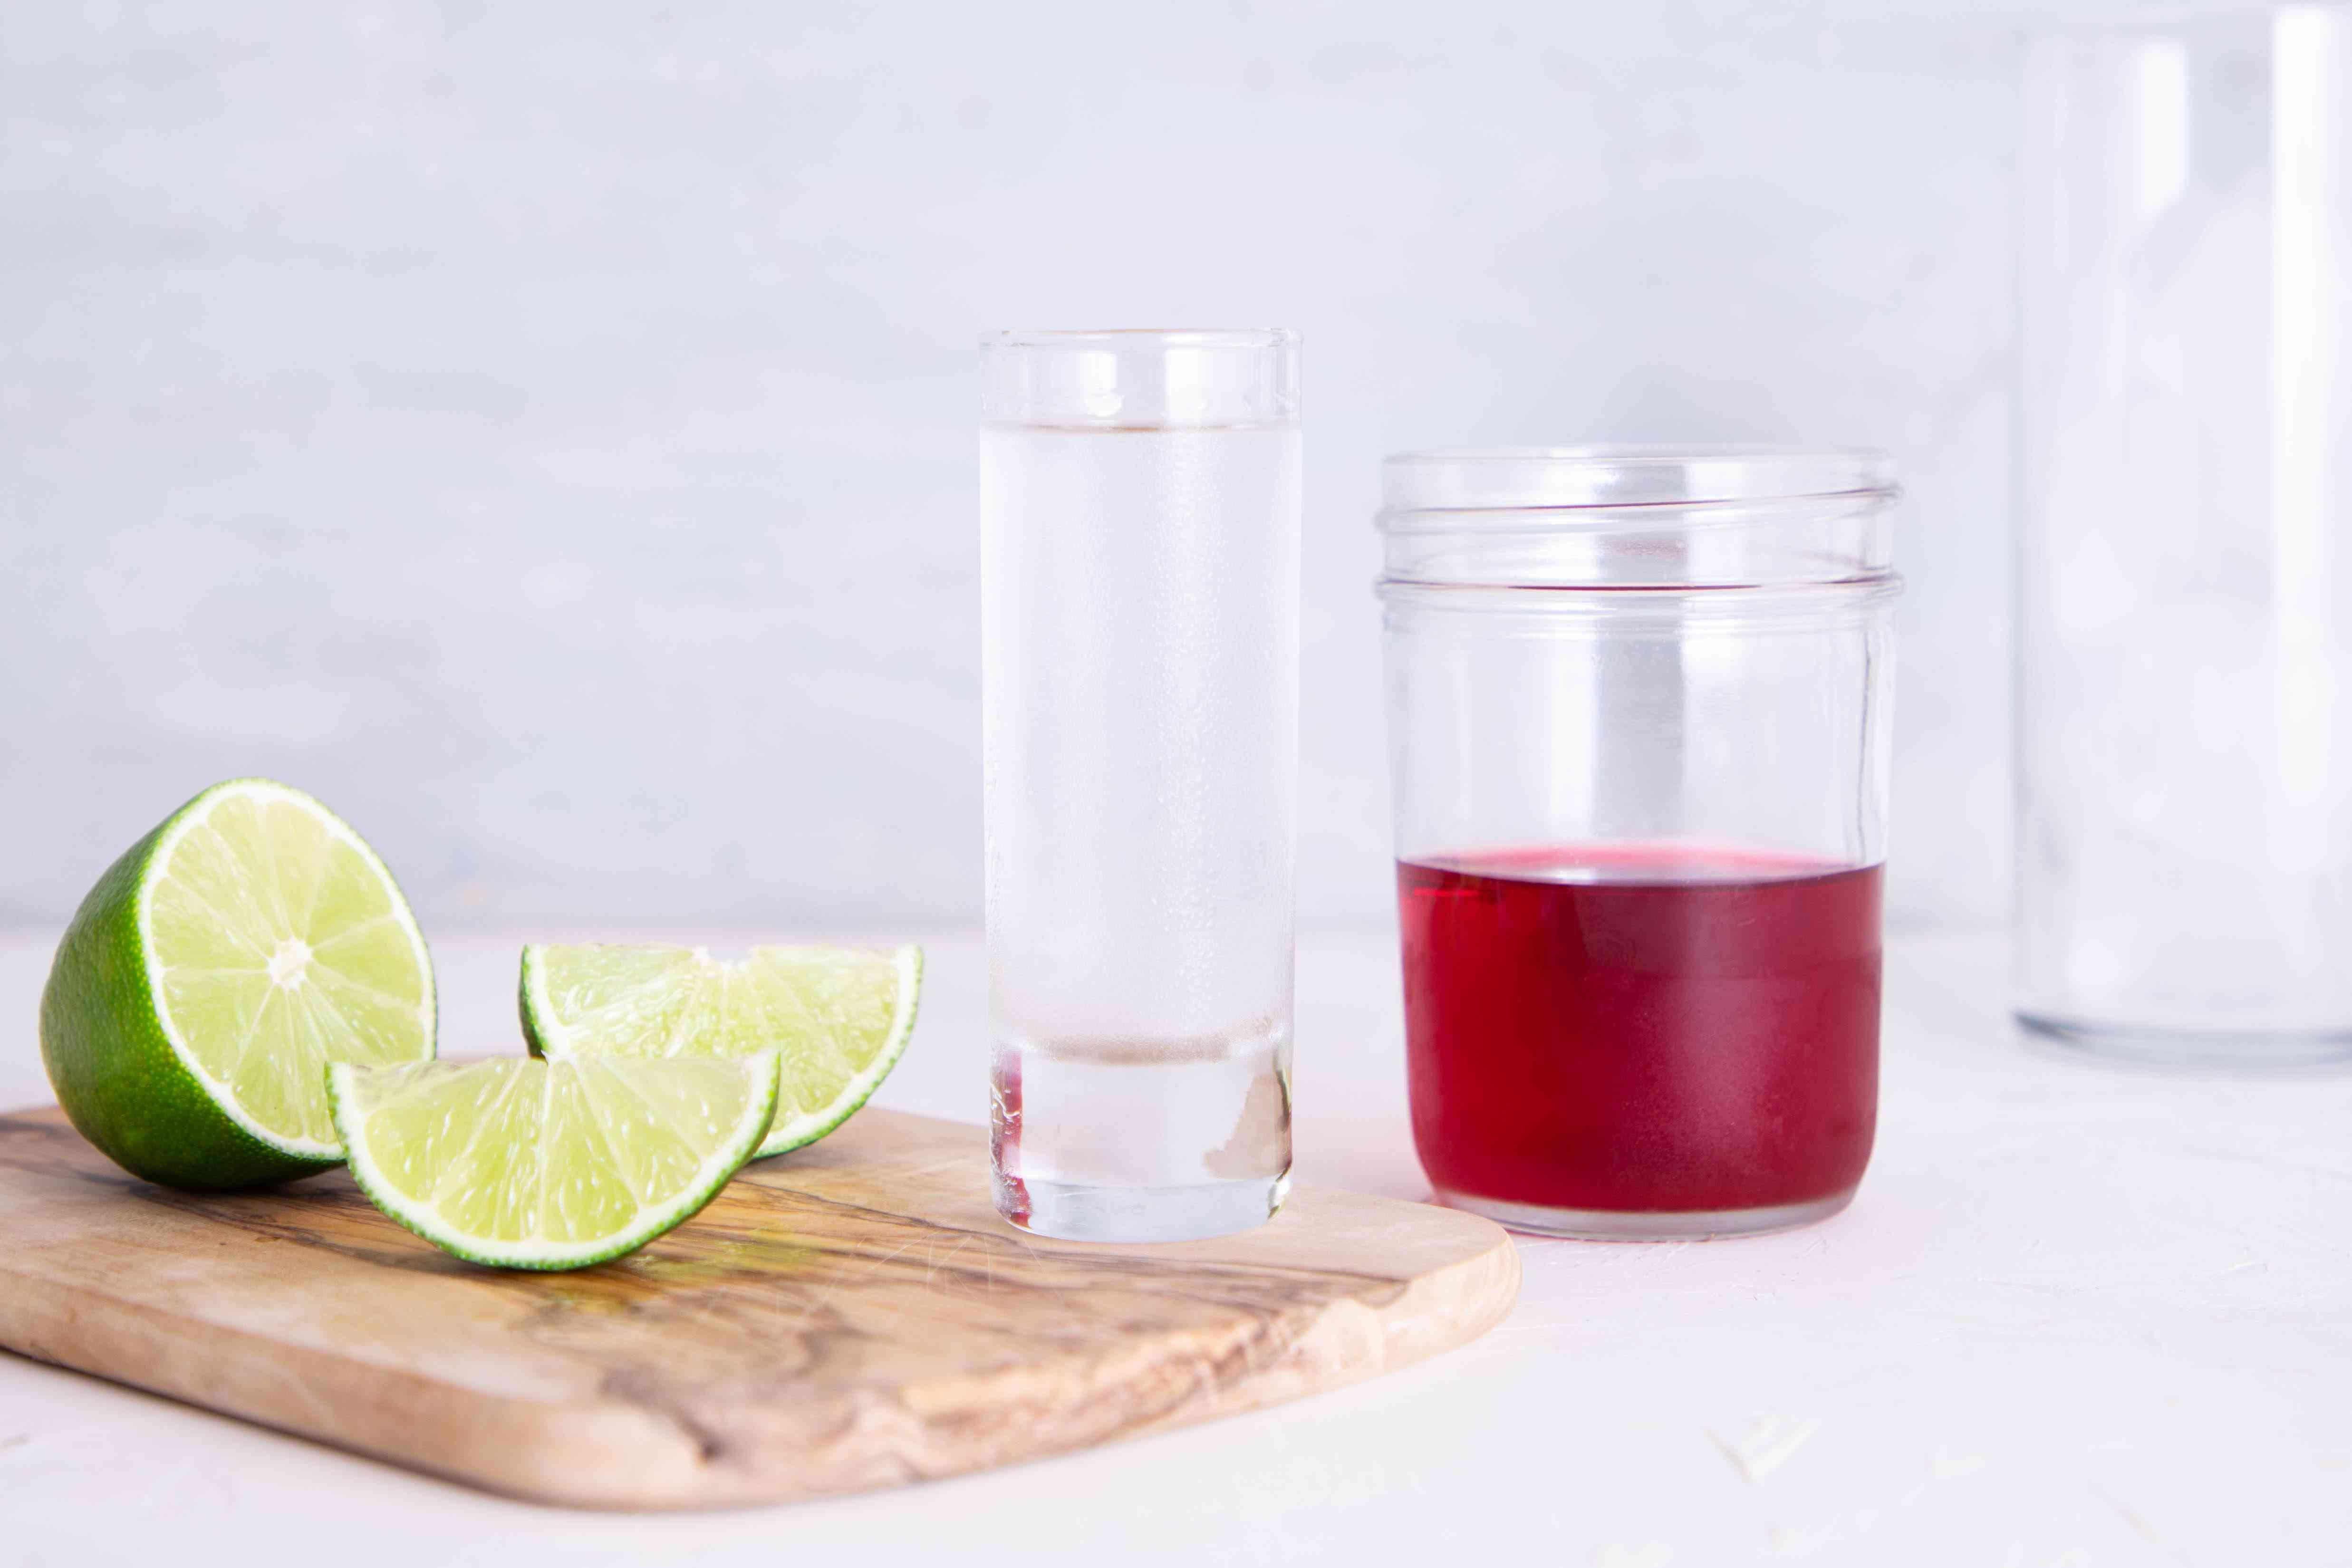 Cape Cod: the Popular Vodka and Cranberry Drink ingredients, lime, vodka, cranberry juice